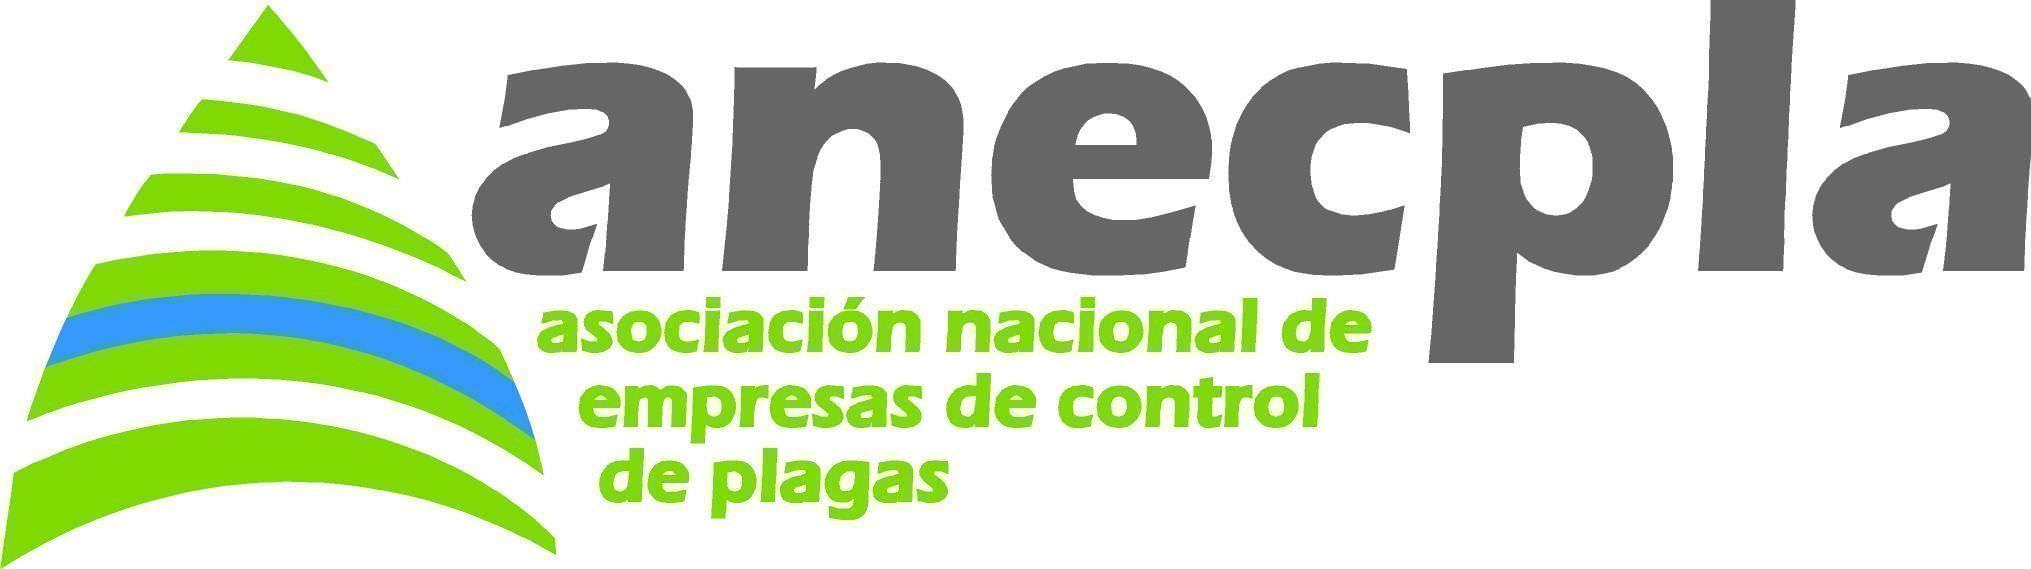 anecpla_logo.jpg